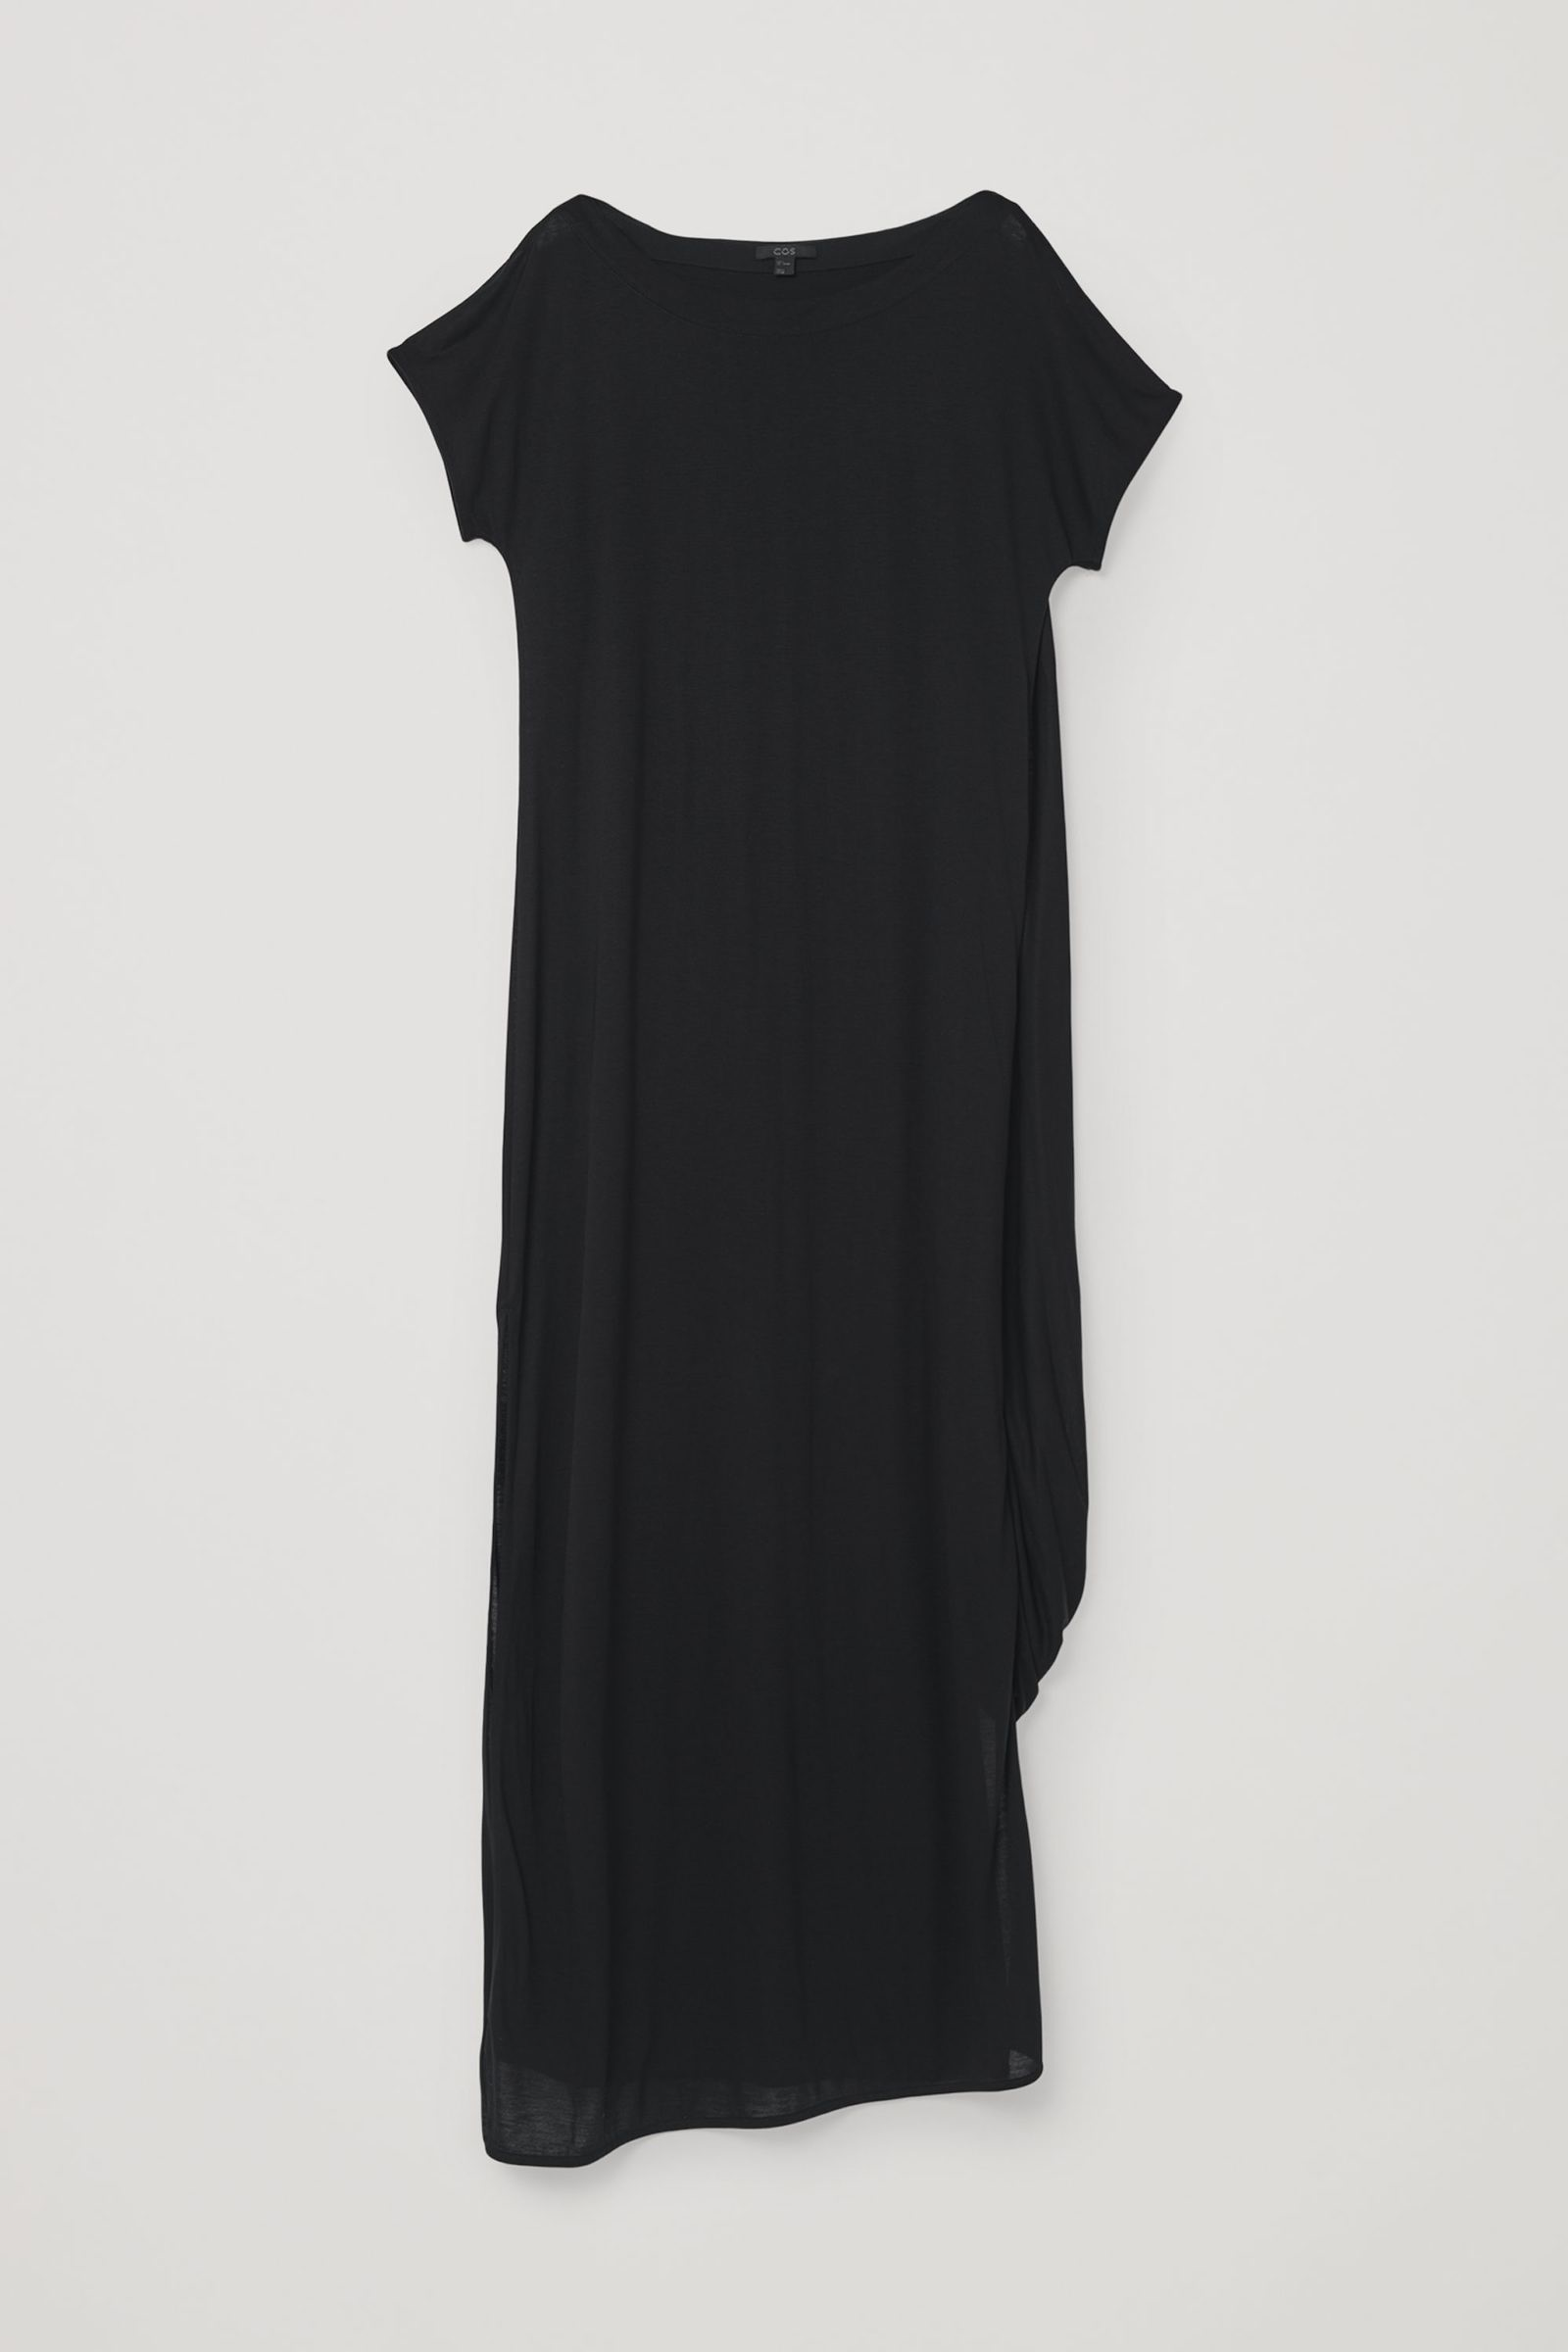 COS 롱 드레이프드 드레스의 블랙컬러 Product입니다.